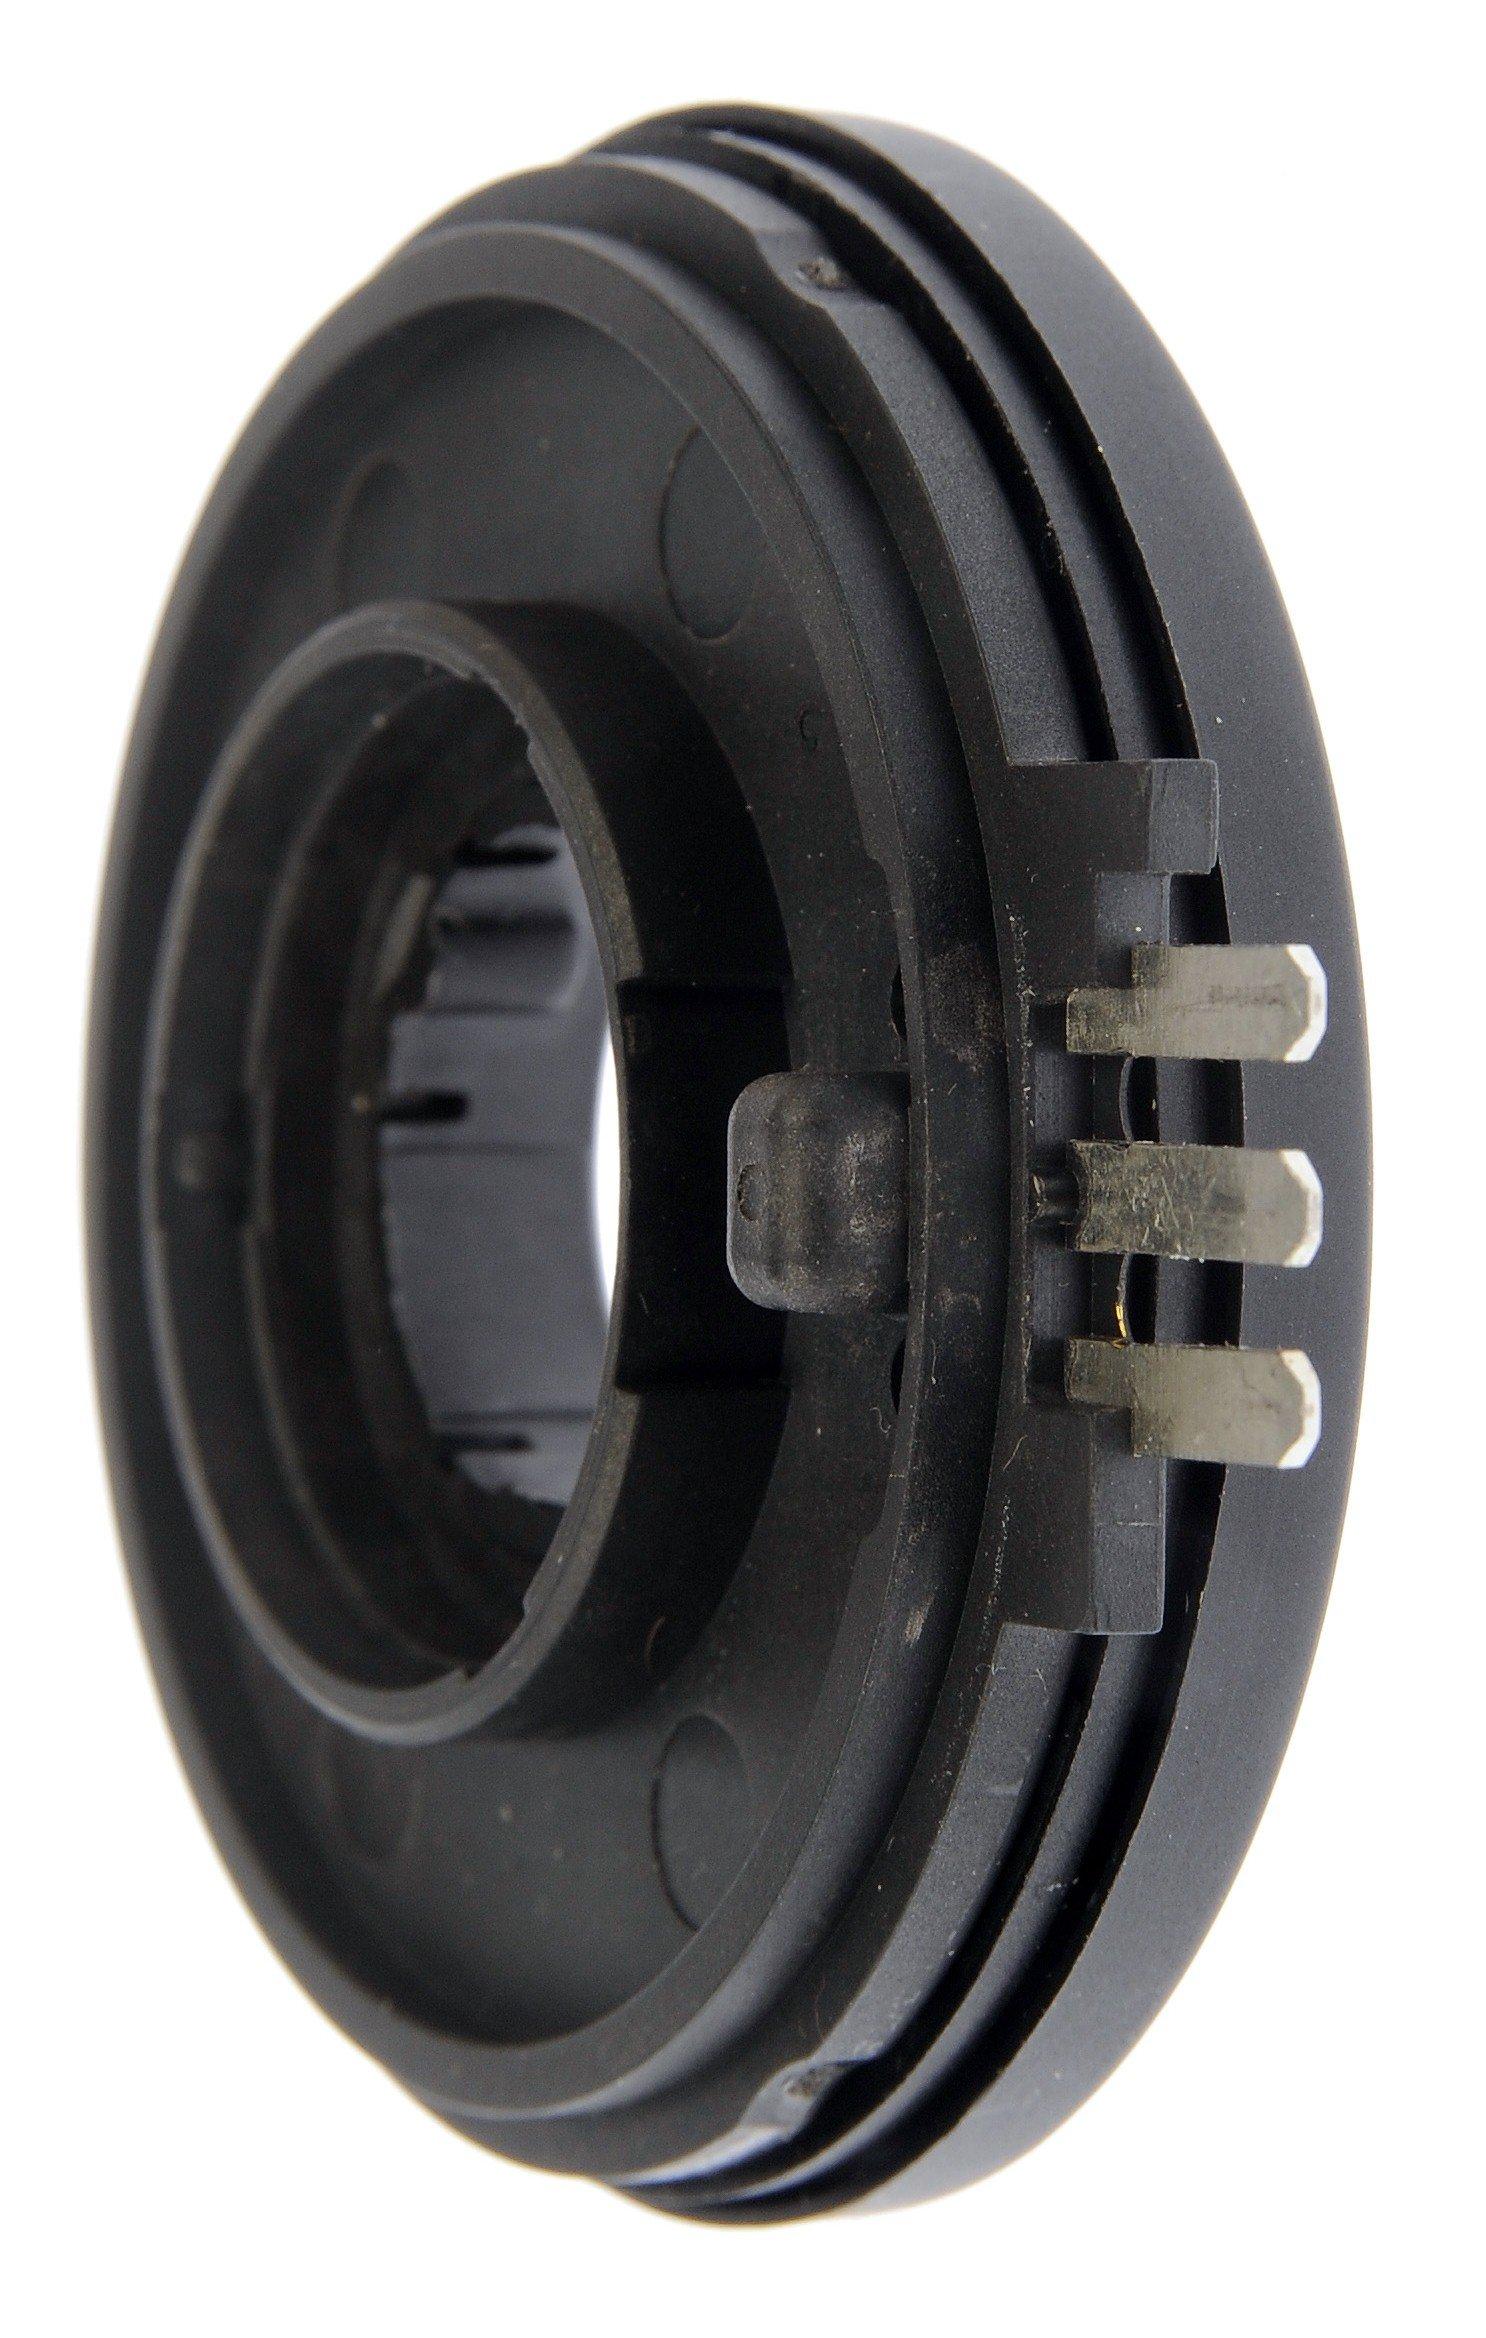 Dorman 600-120 Transfer Case Motor Encoder Ring